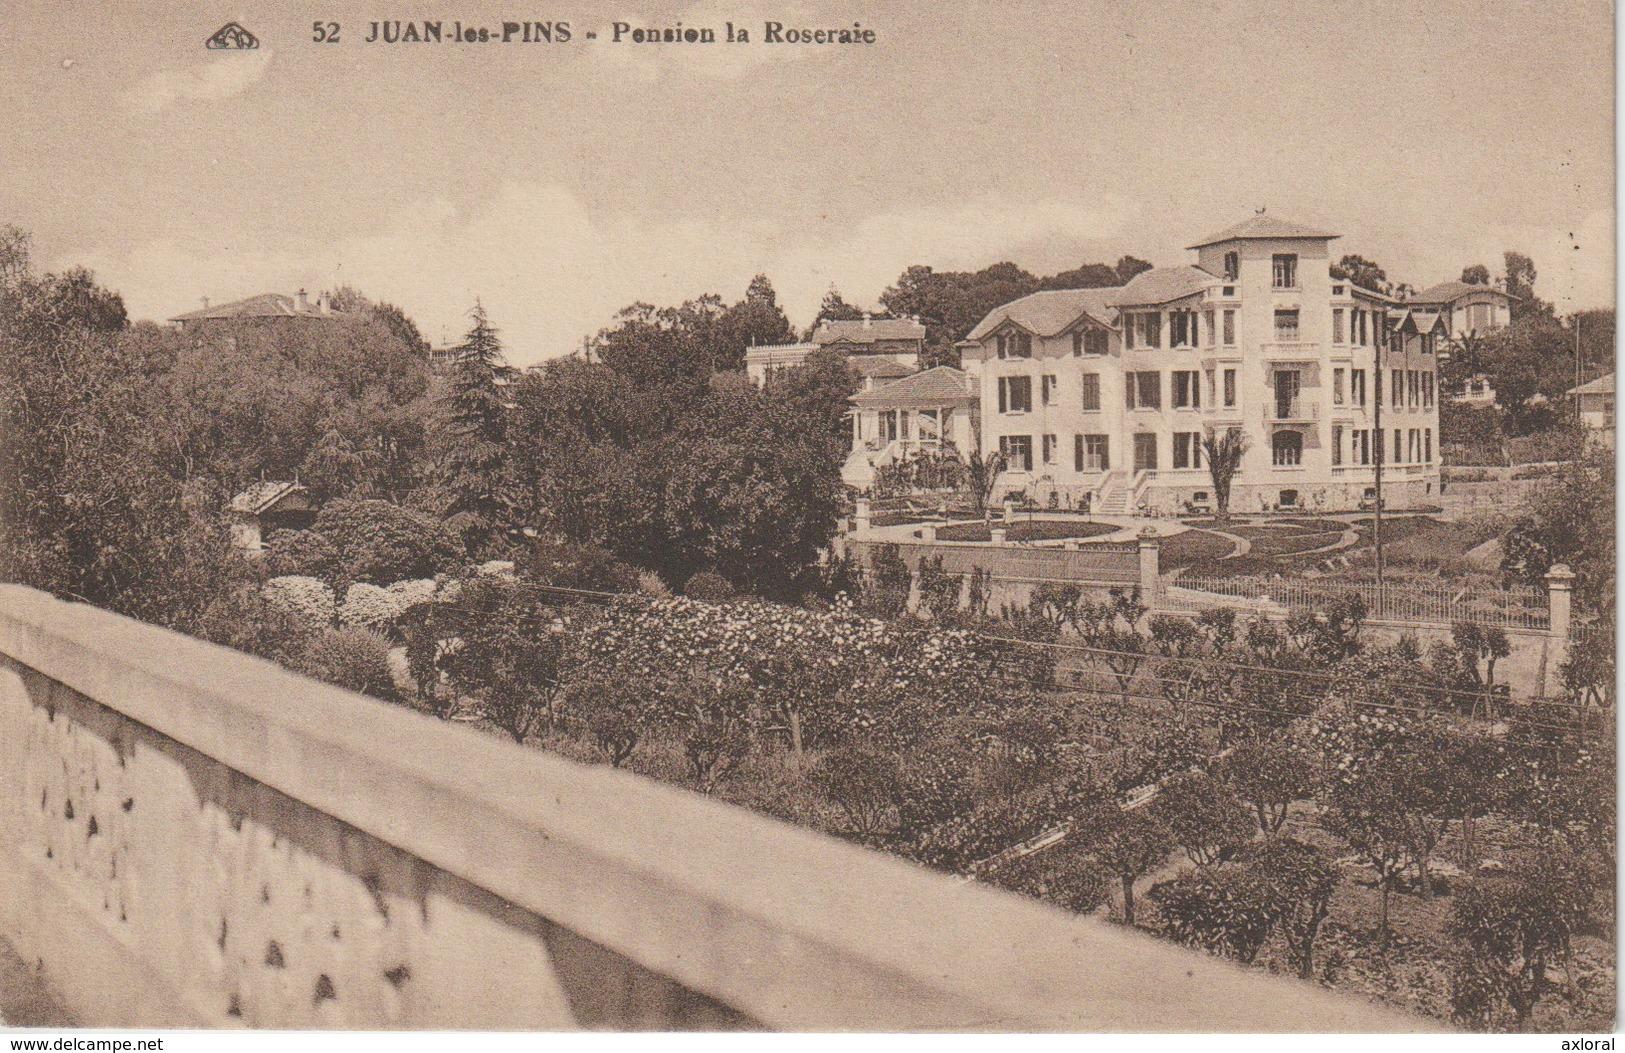 06 JUAN LES PINS 1930 ? Pension LA ROSERAIE Ed. Mlles ROBINS Mercerie - France